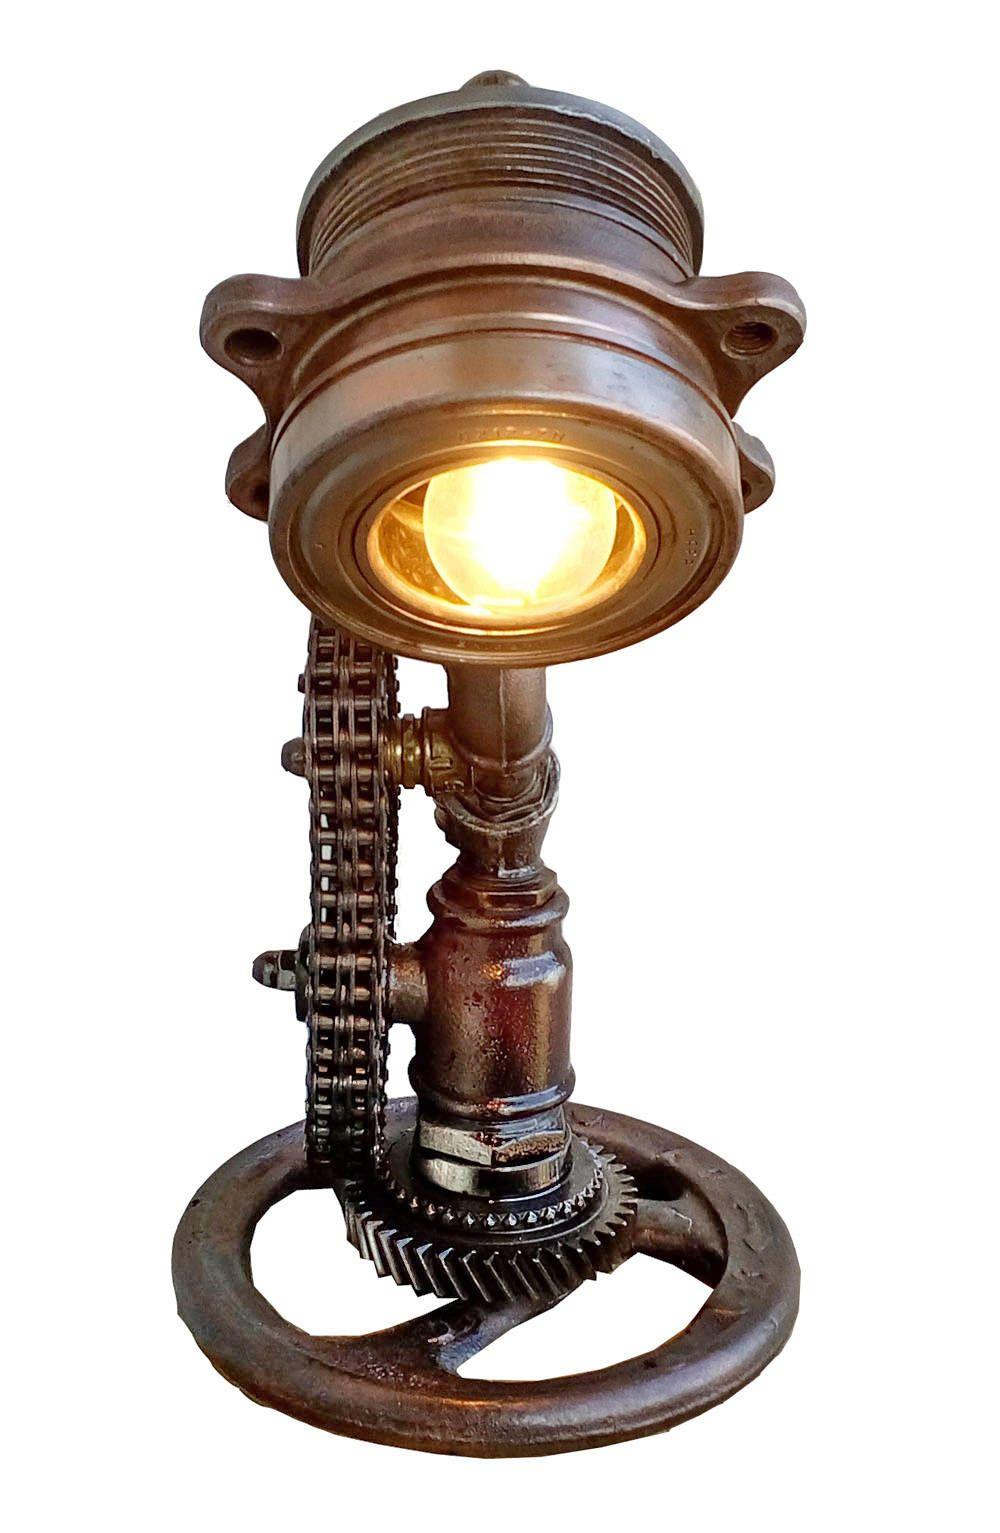 Edison Bulb Lamp Victorian Lighting Industrial Look Lighting Vintage Style Lamps Steampunk Light Bulbs Reading Lamps For Lamp Vintage Bulbs Lamp Steampunk Lamp